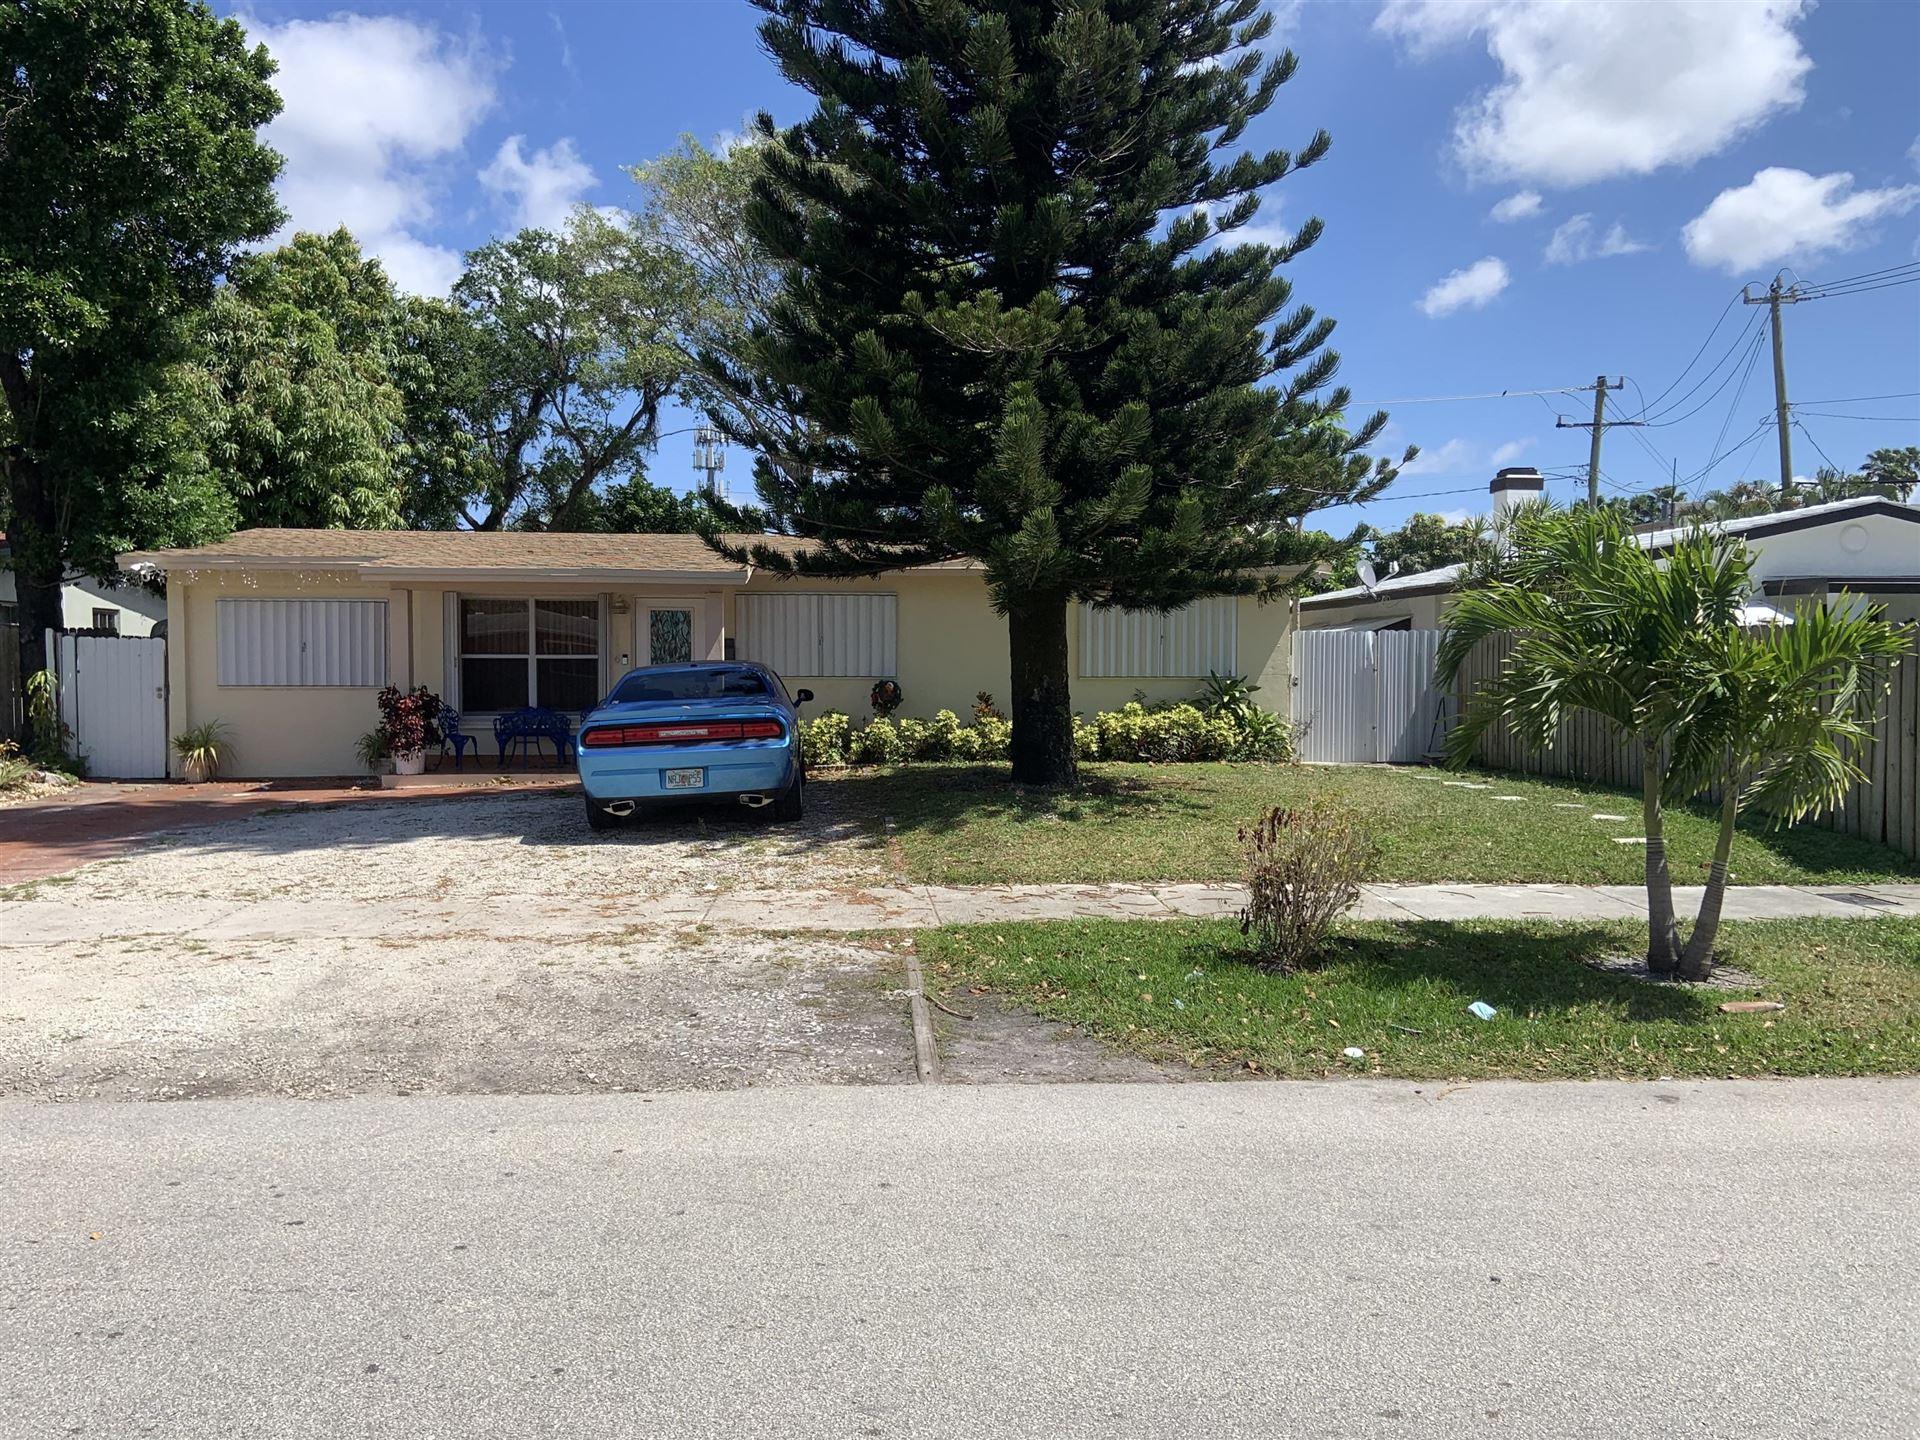 1116 SW 22 Av Avenue, Fort Lauderdale, FL 33312 - MLS#: RX-10700266